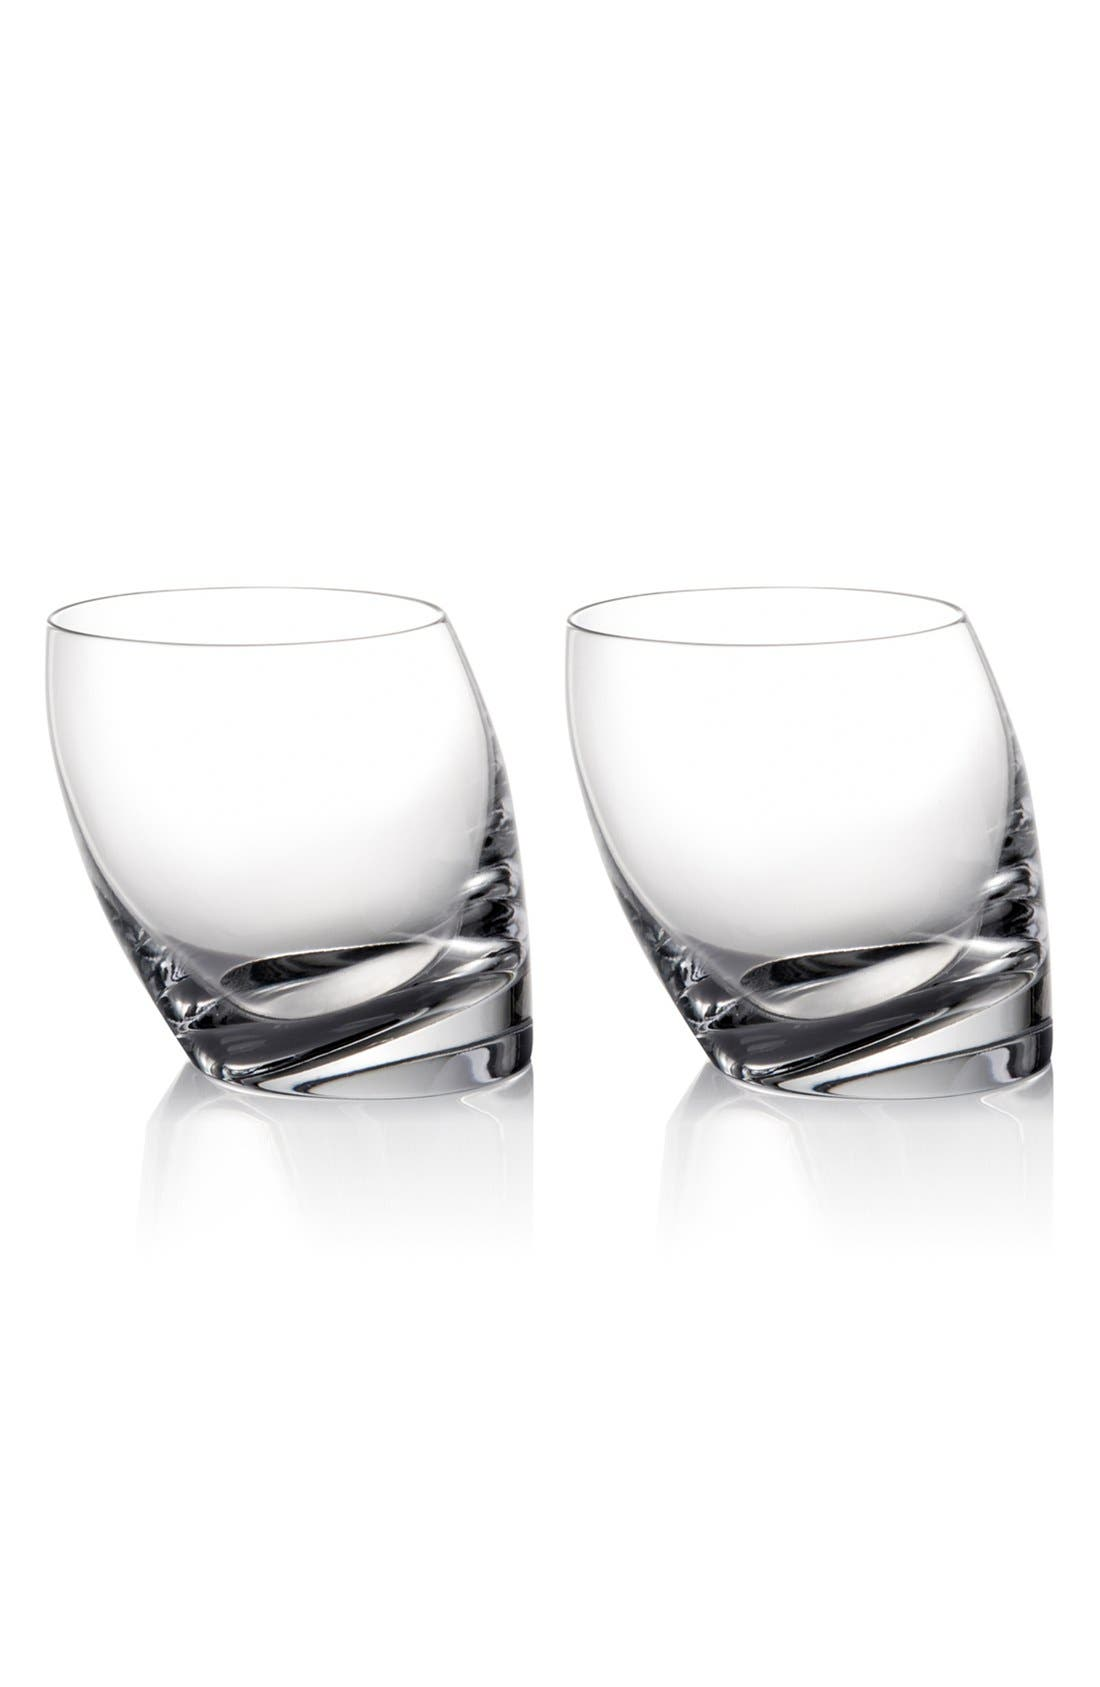 Main Image - Nambé 'Tilt' Double Old-Fashioned Glasses (Set of 2)